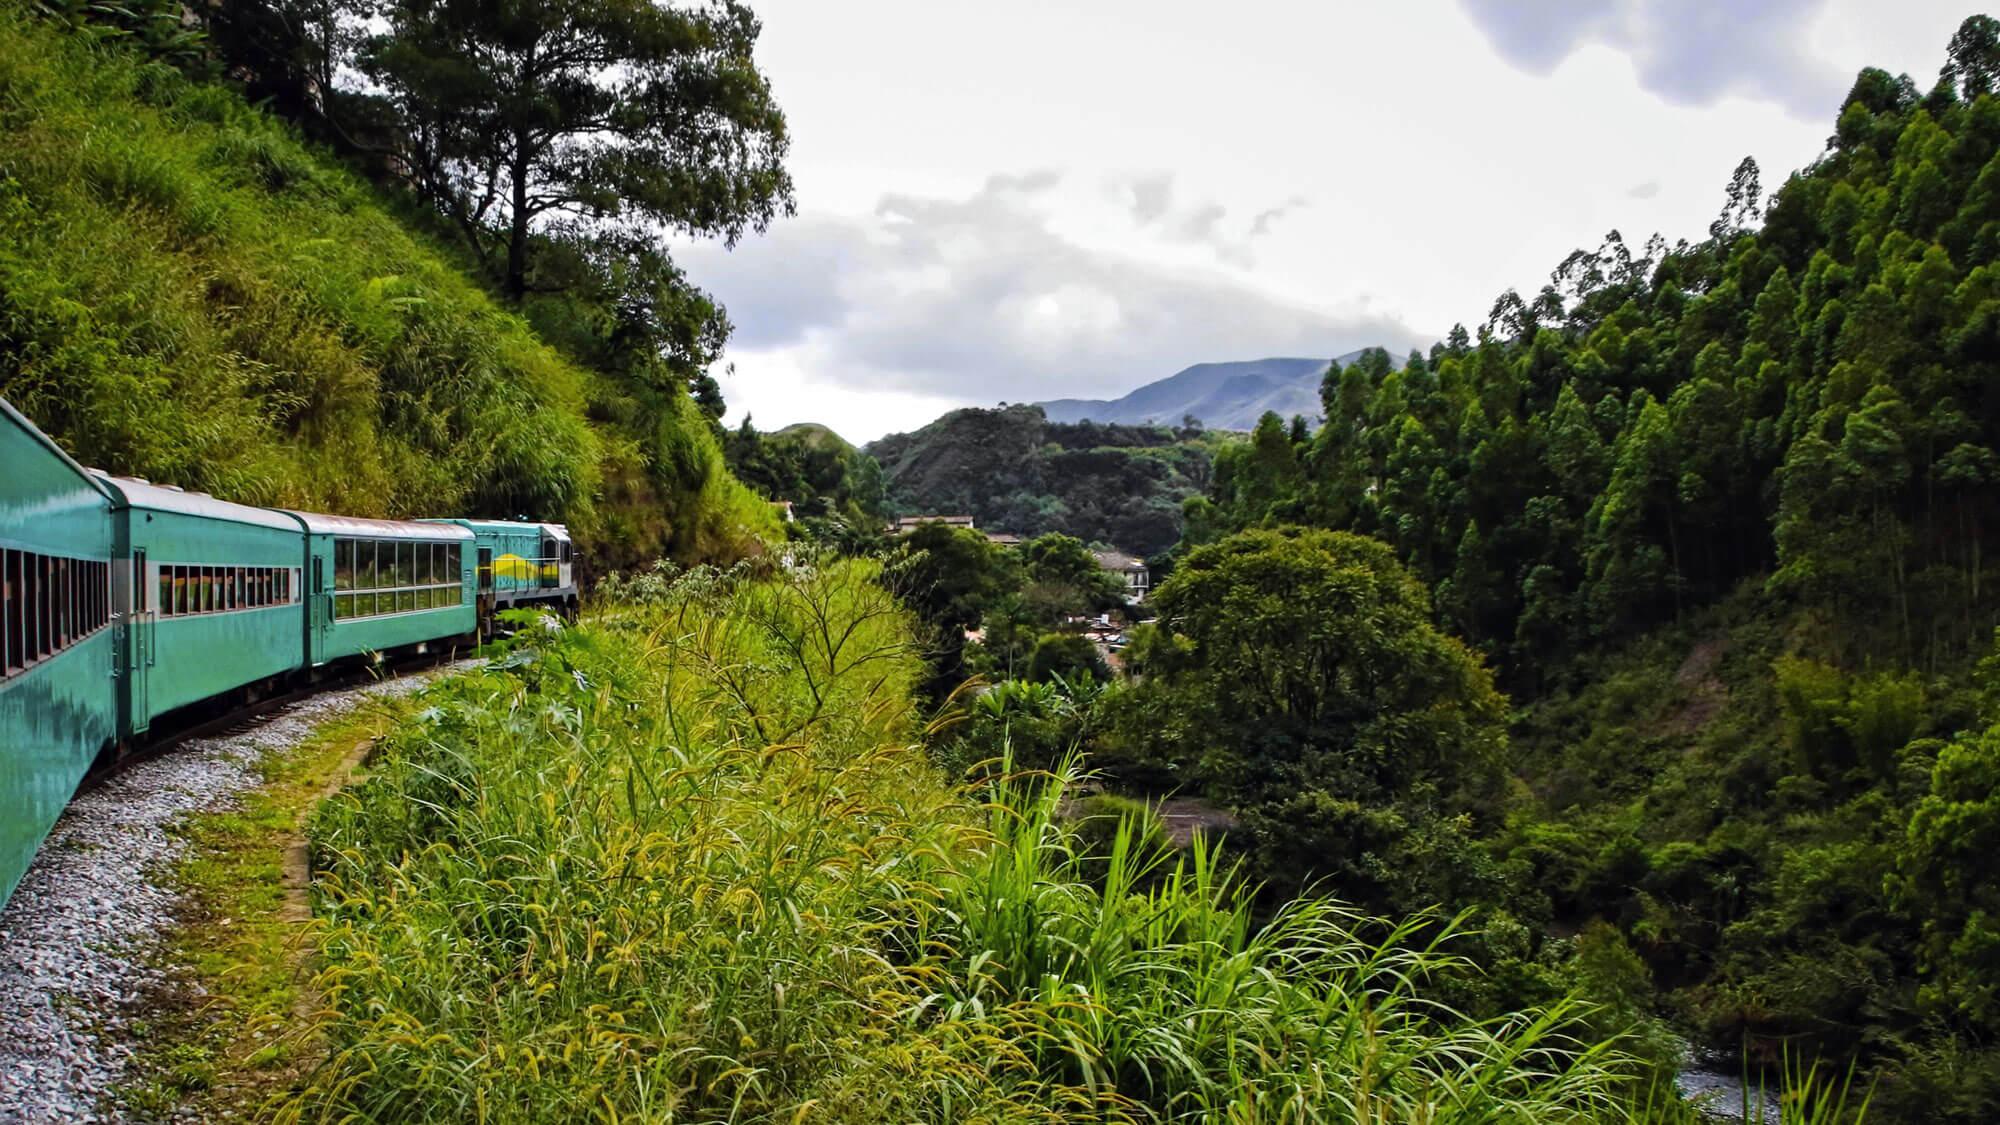 Train Ouro Preto to Mariana